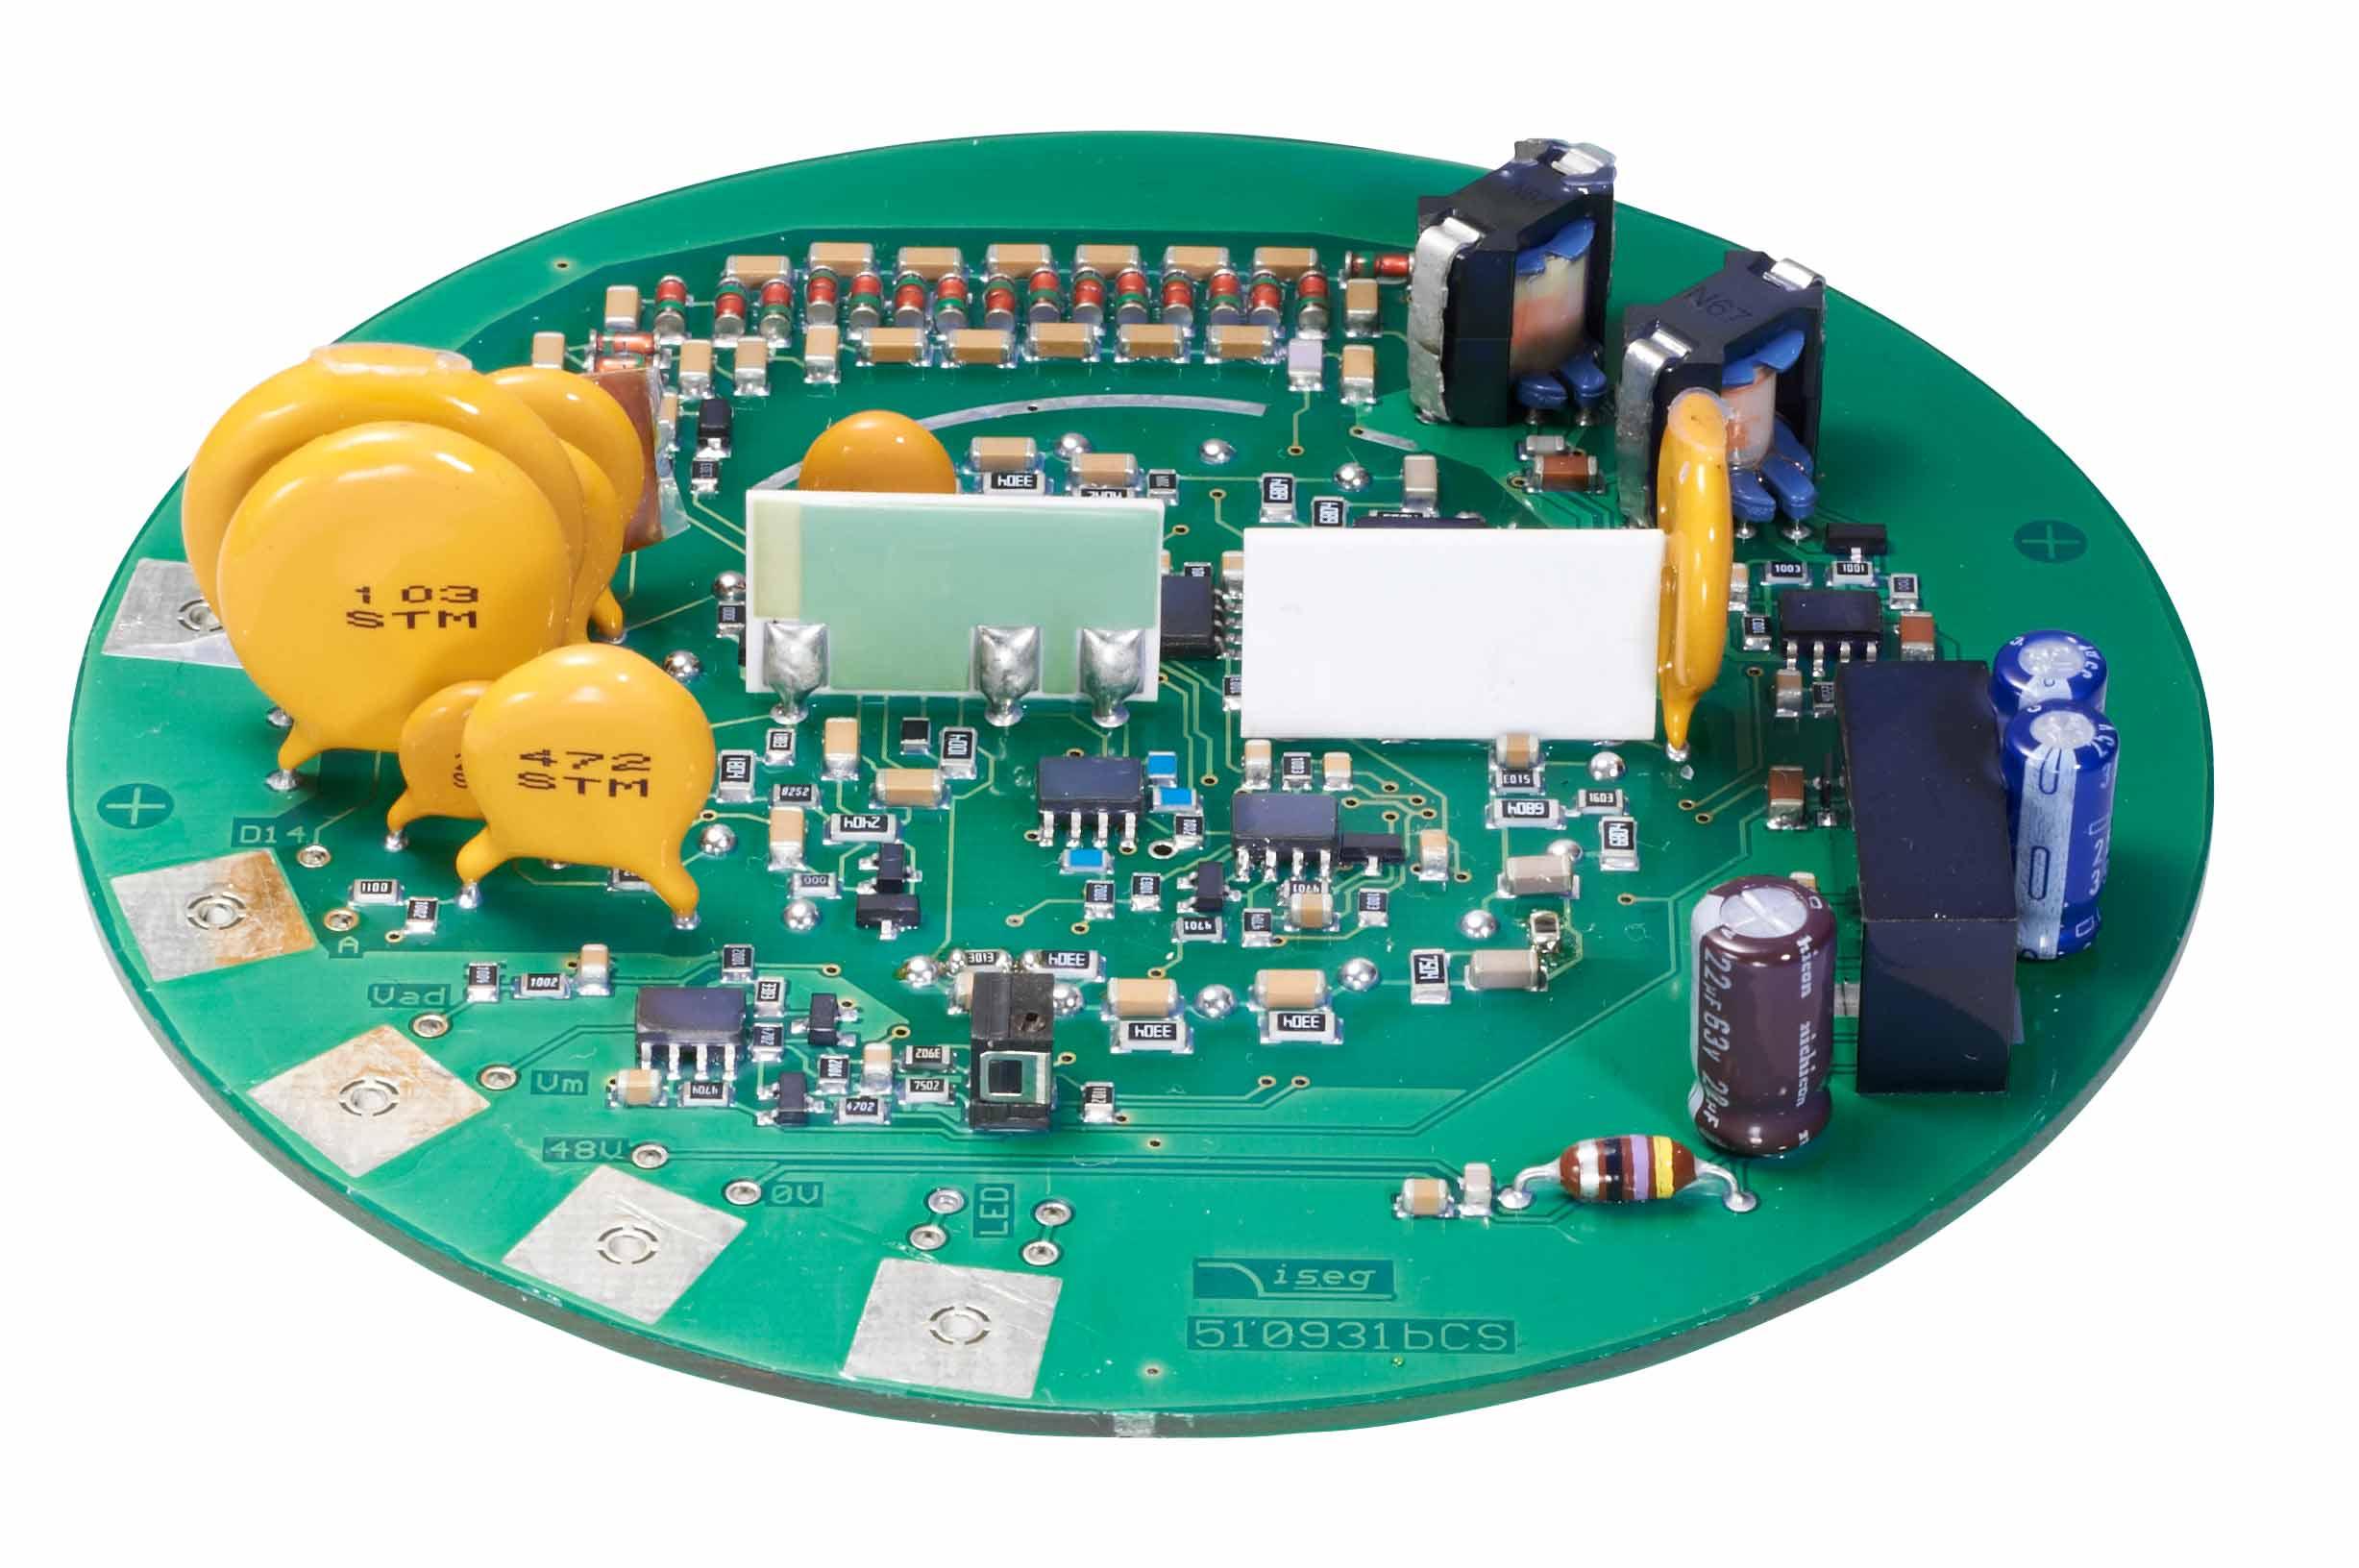 Convertisseur haute tension DC PHQ 7081 ISEG